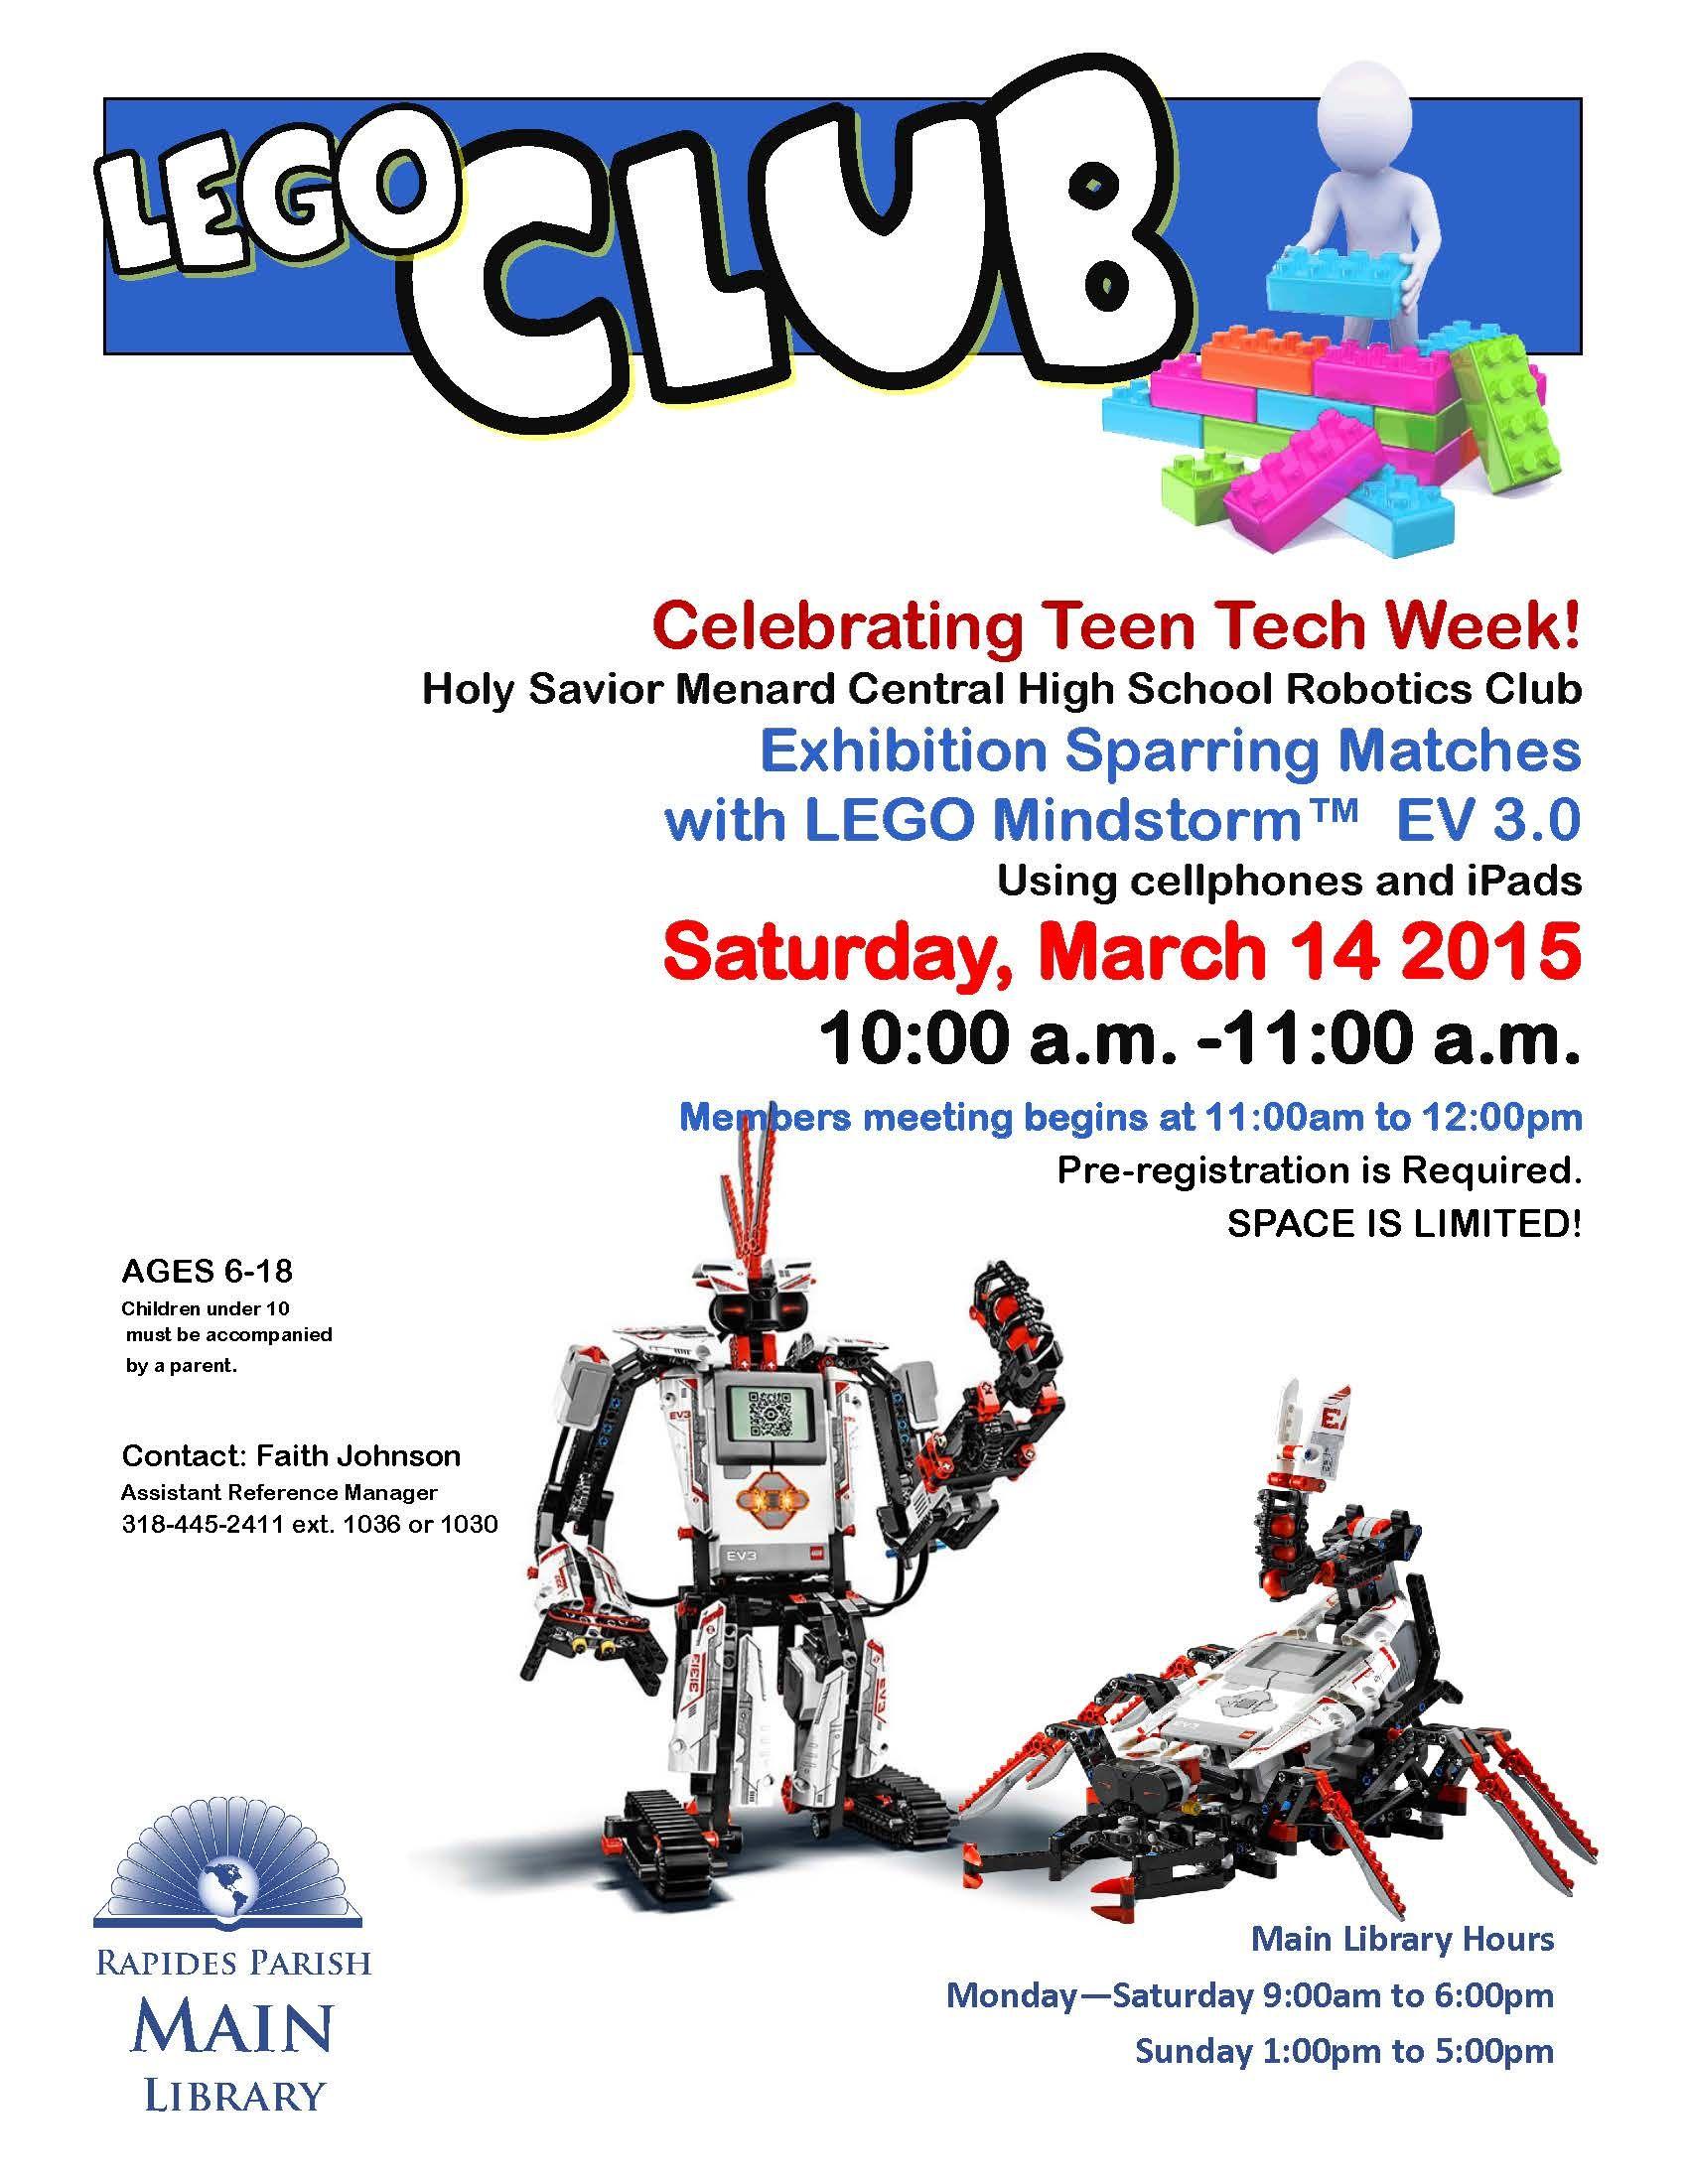 LEGO Mindstorm Robotic Exhibition! Celebrating Teen Tech